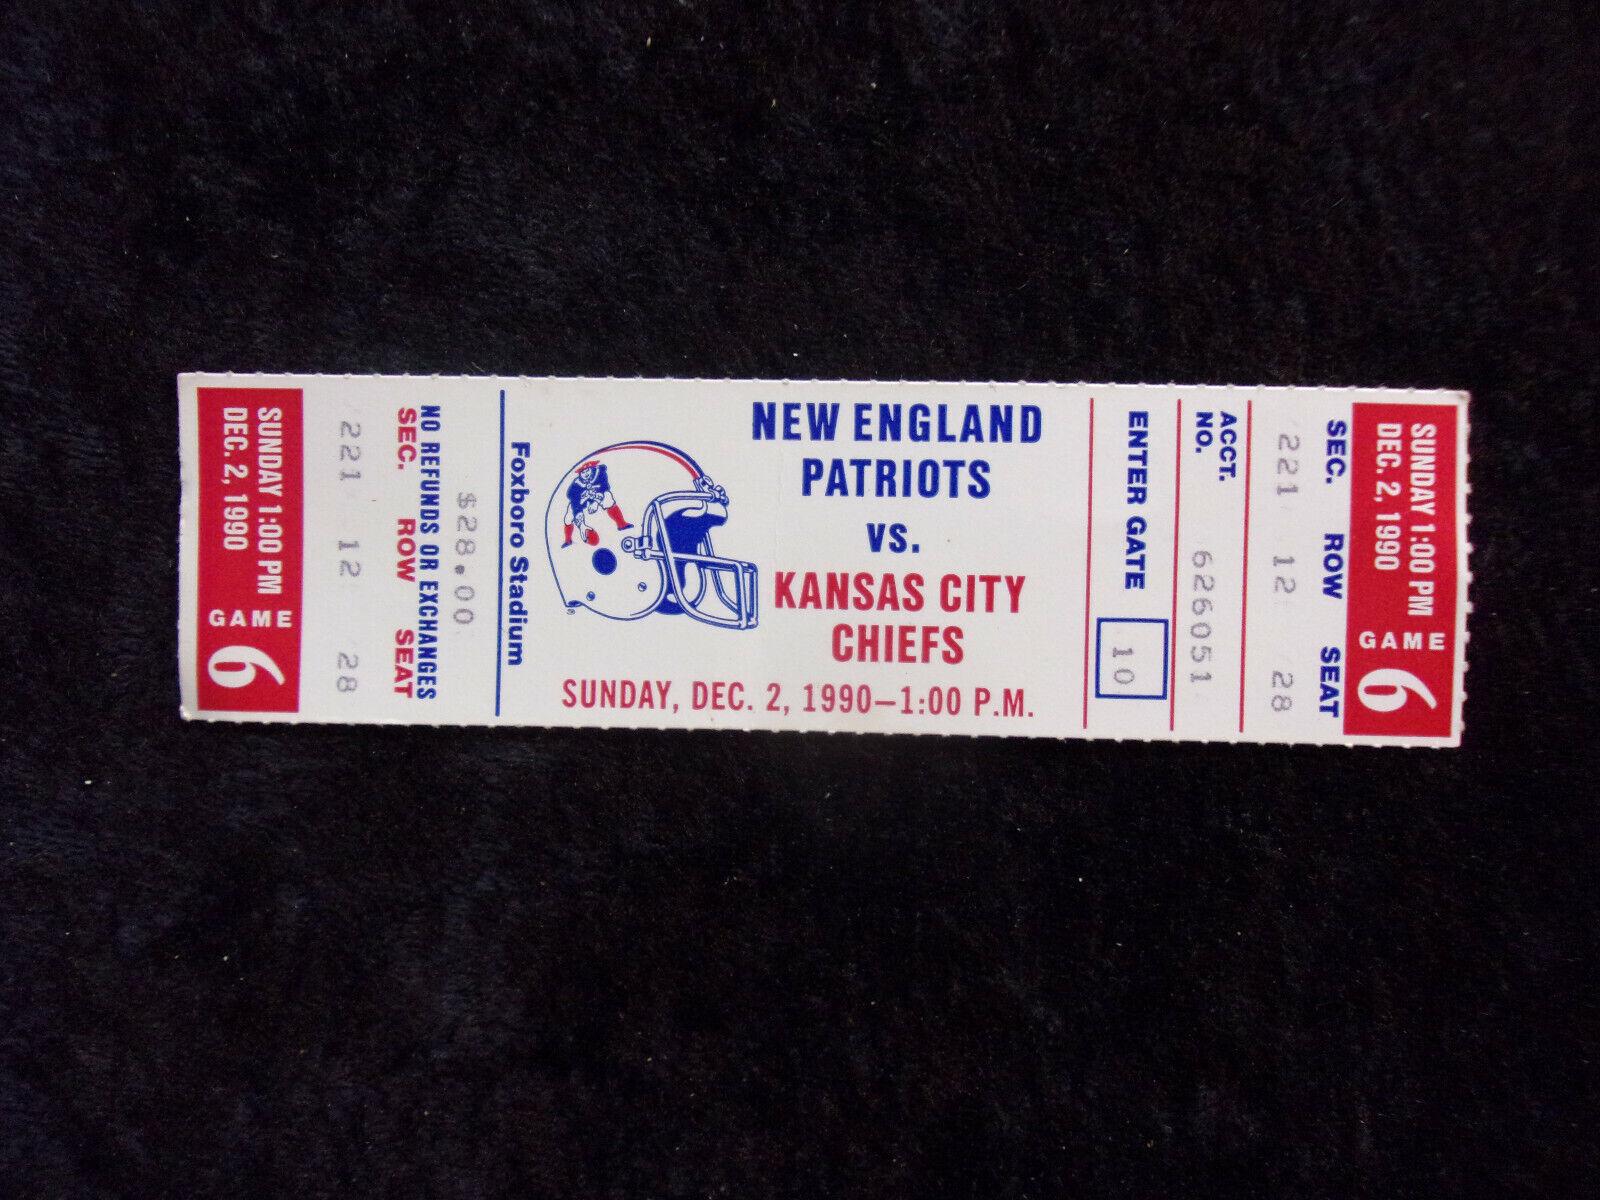 Dec. 2, 1990 New England Patriots vs Kansas City Chiefs Full Ticket Stub T422